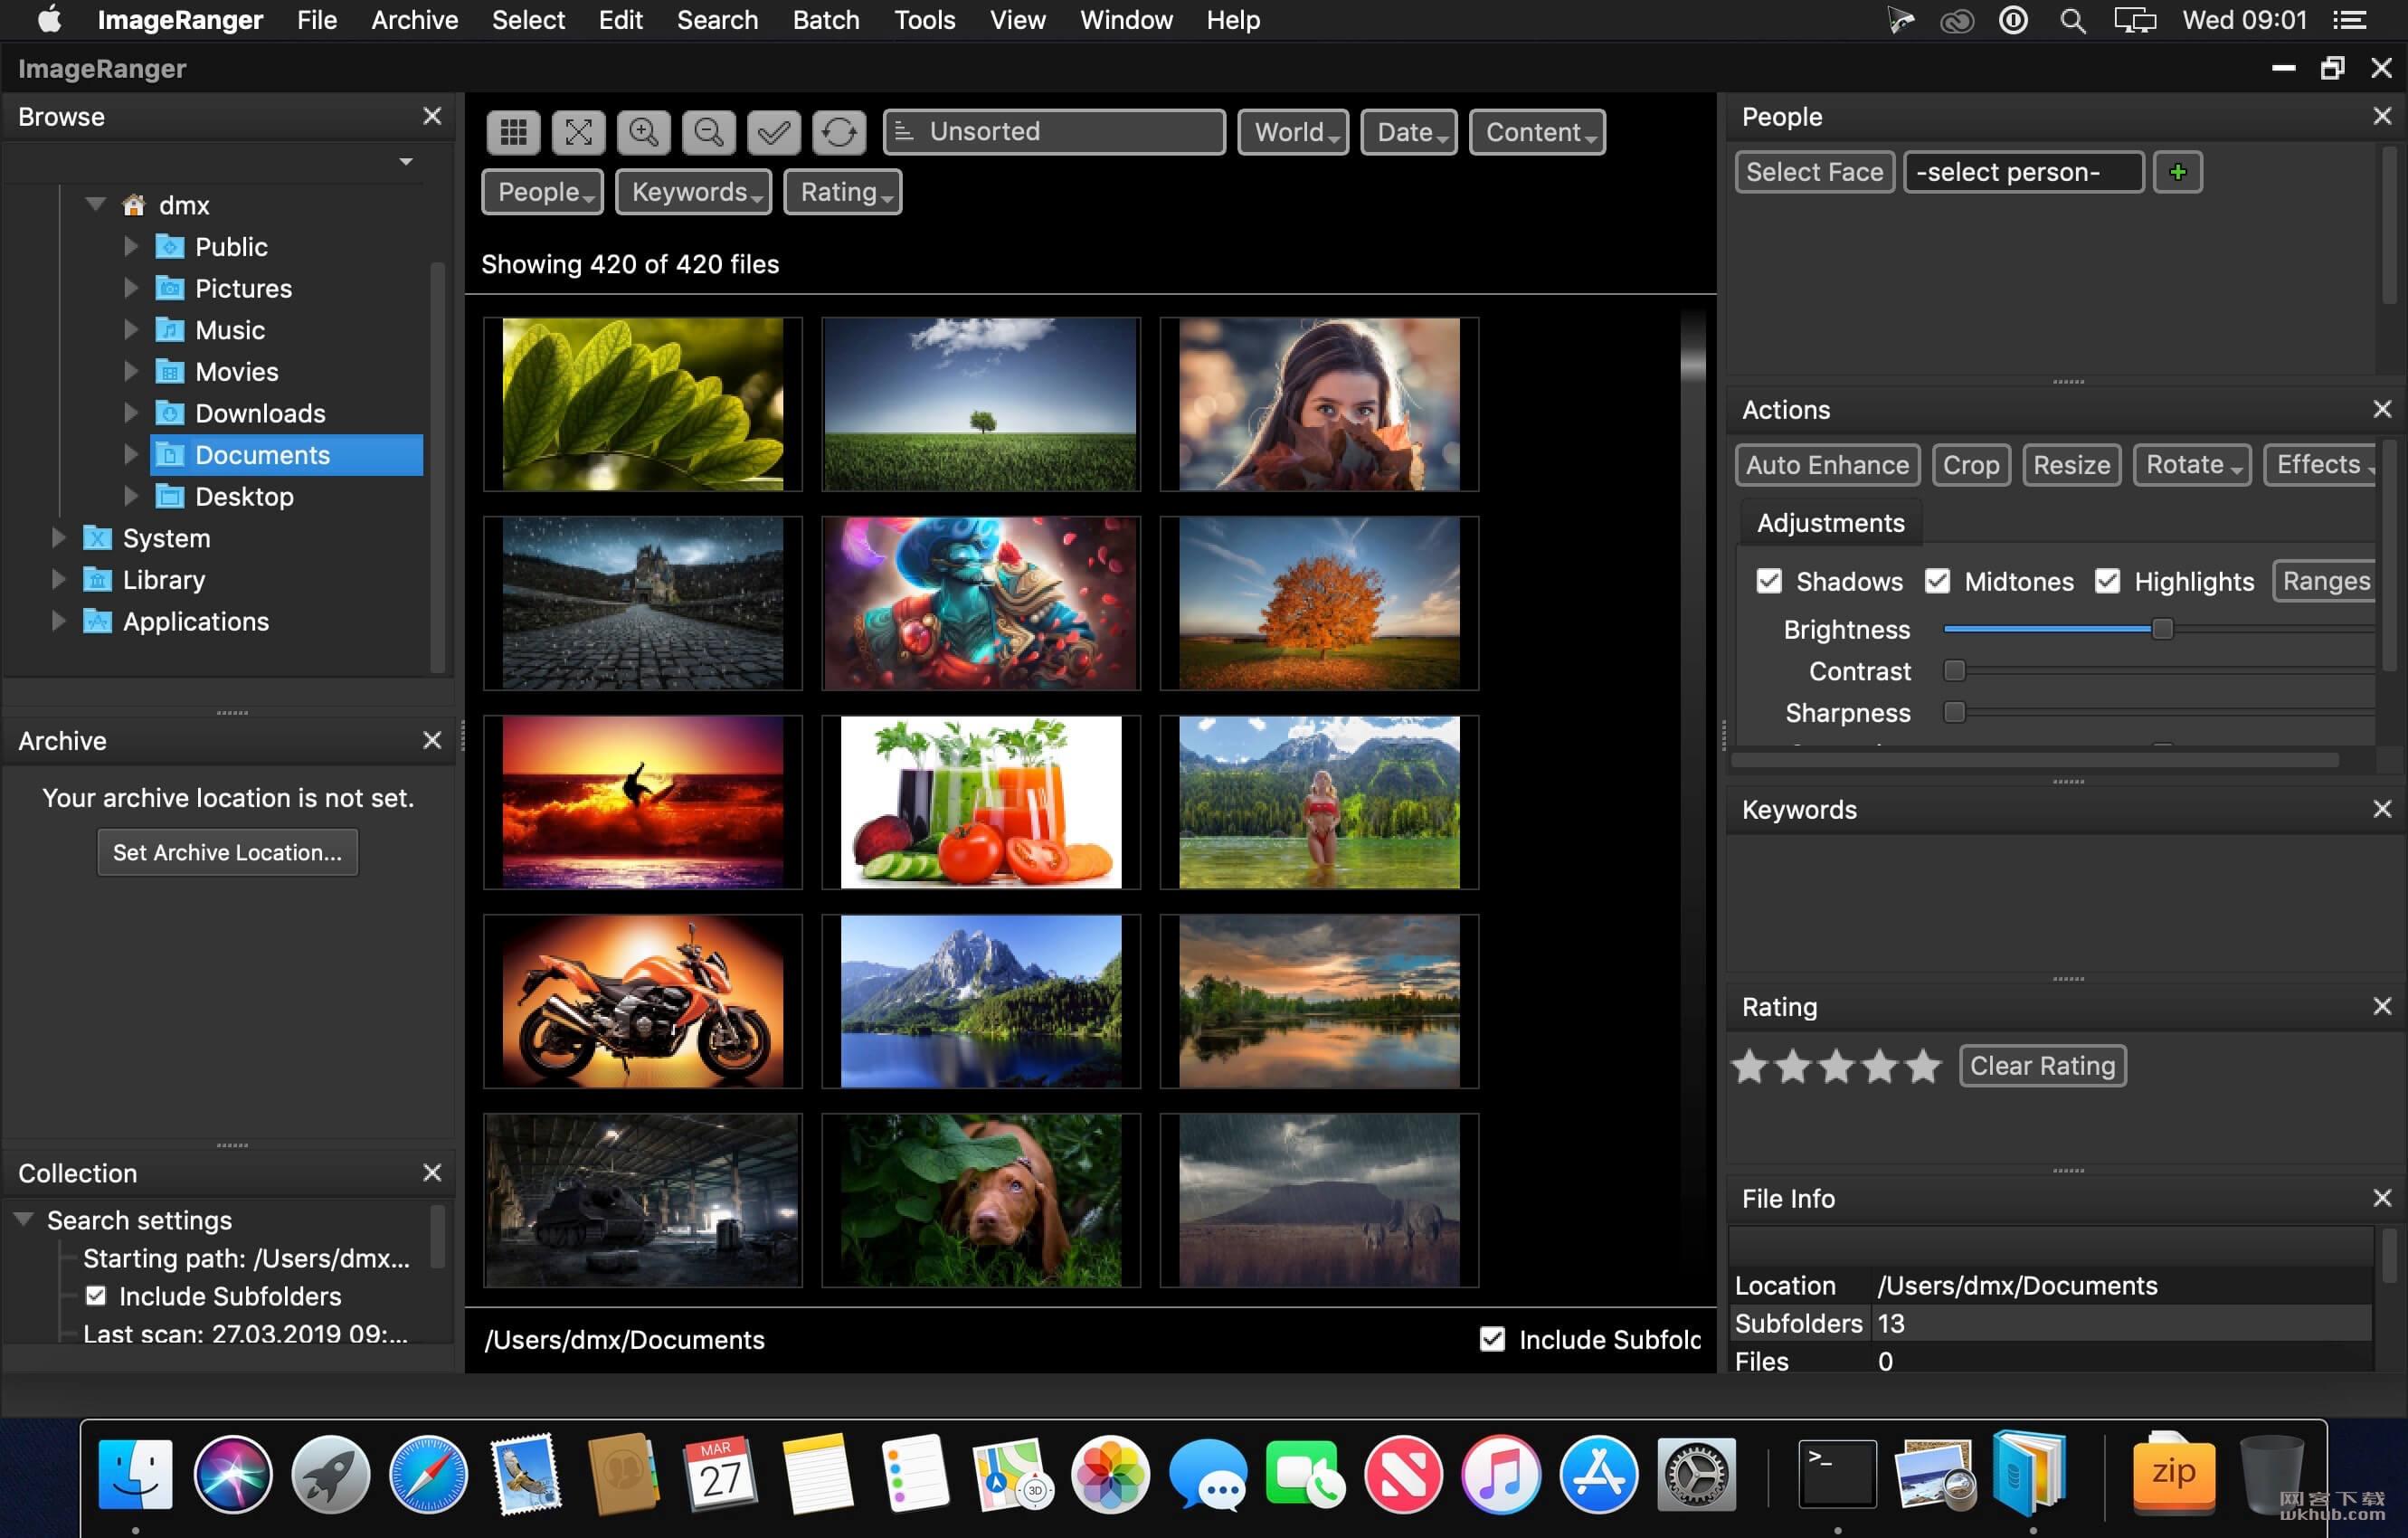 ImageRanger Pro 1.5.6.1279 强大的照片管理工具